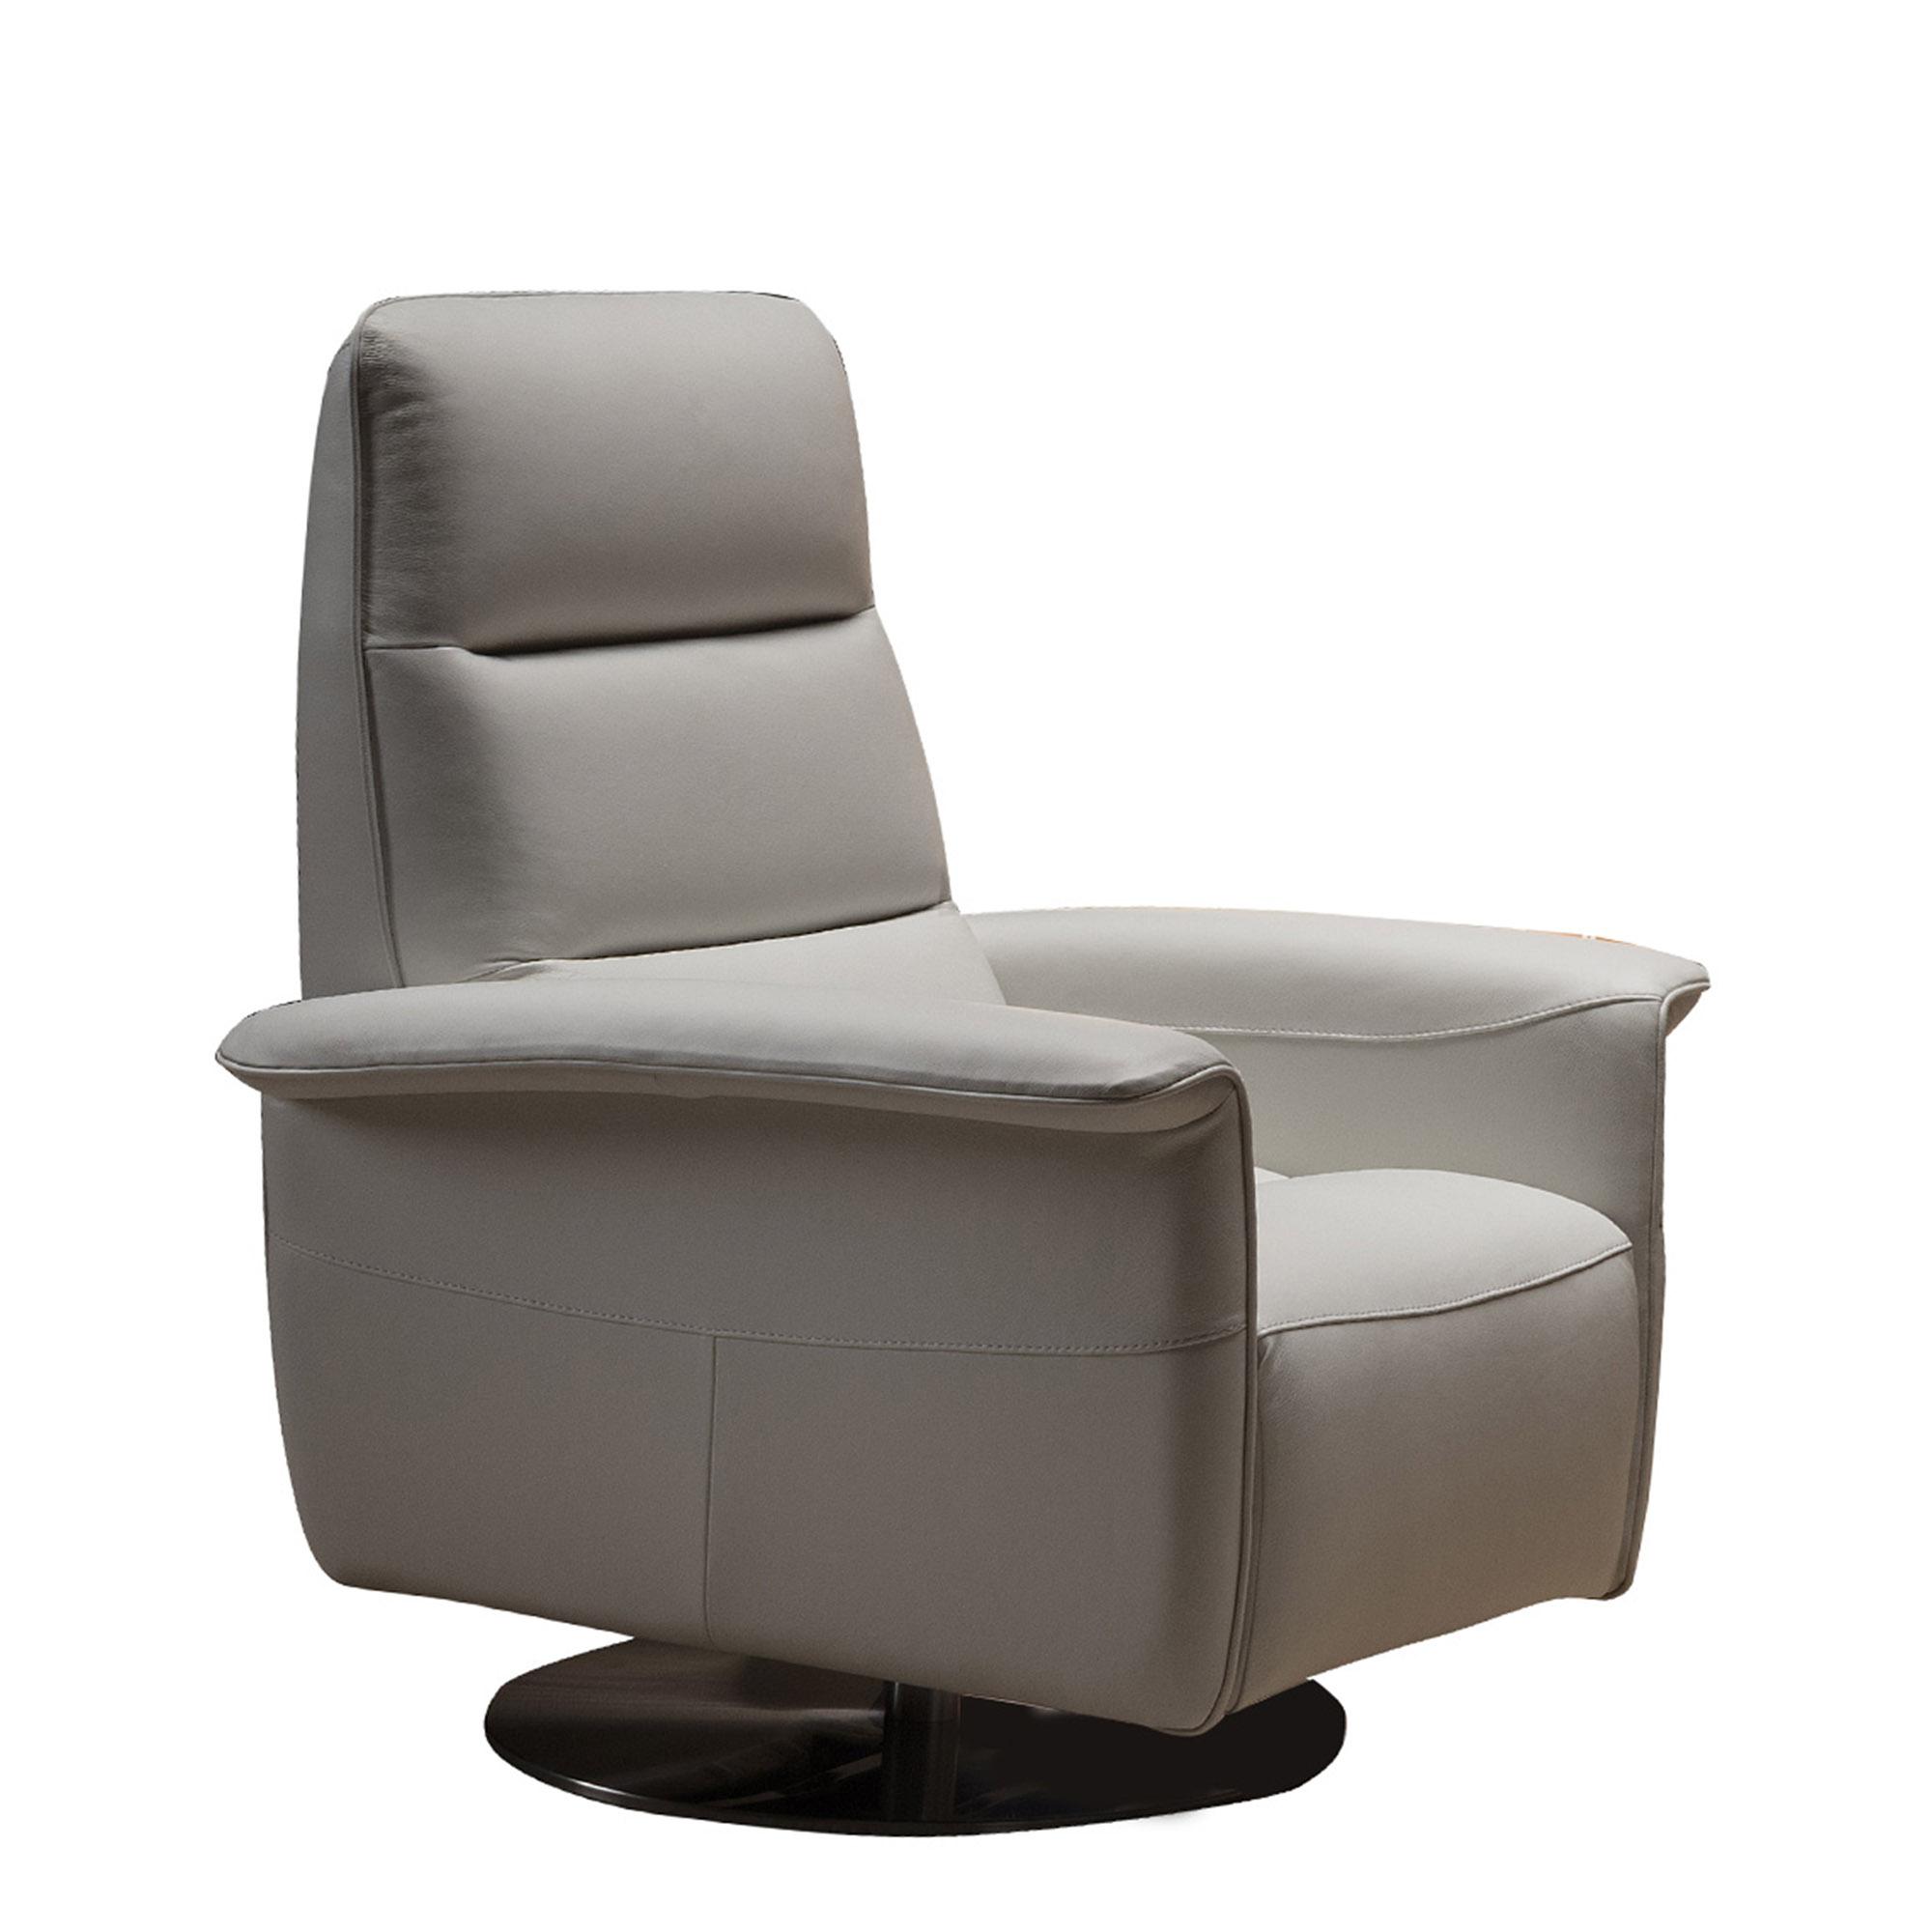 Viaggio Swivel Chair With Manual, Club Chair Recliner Swivel